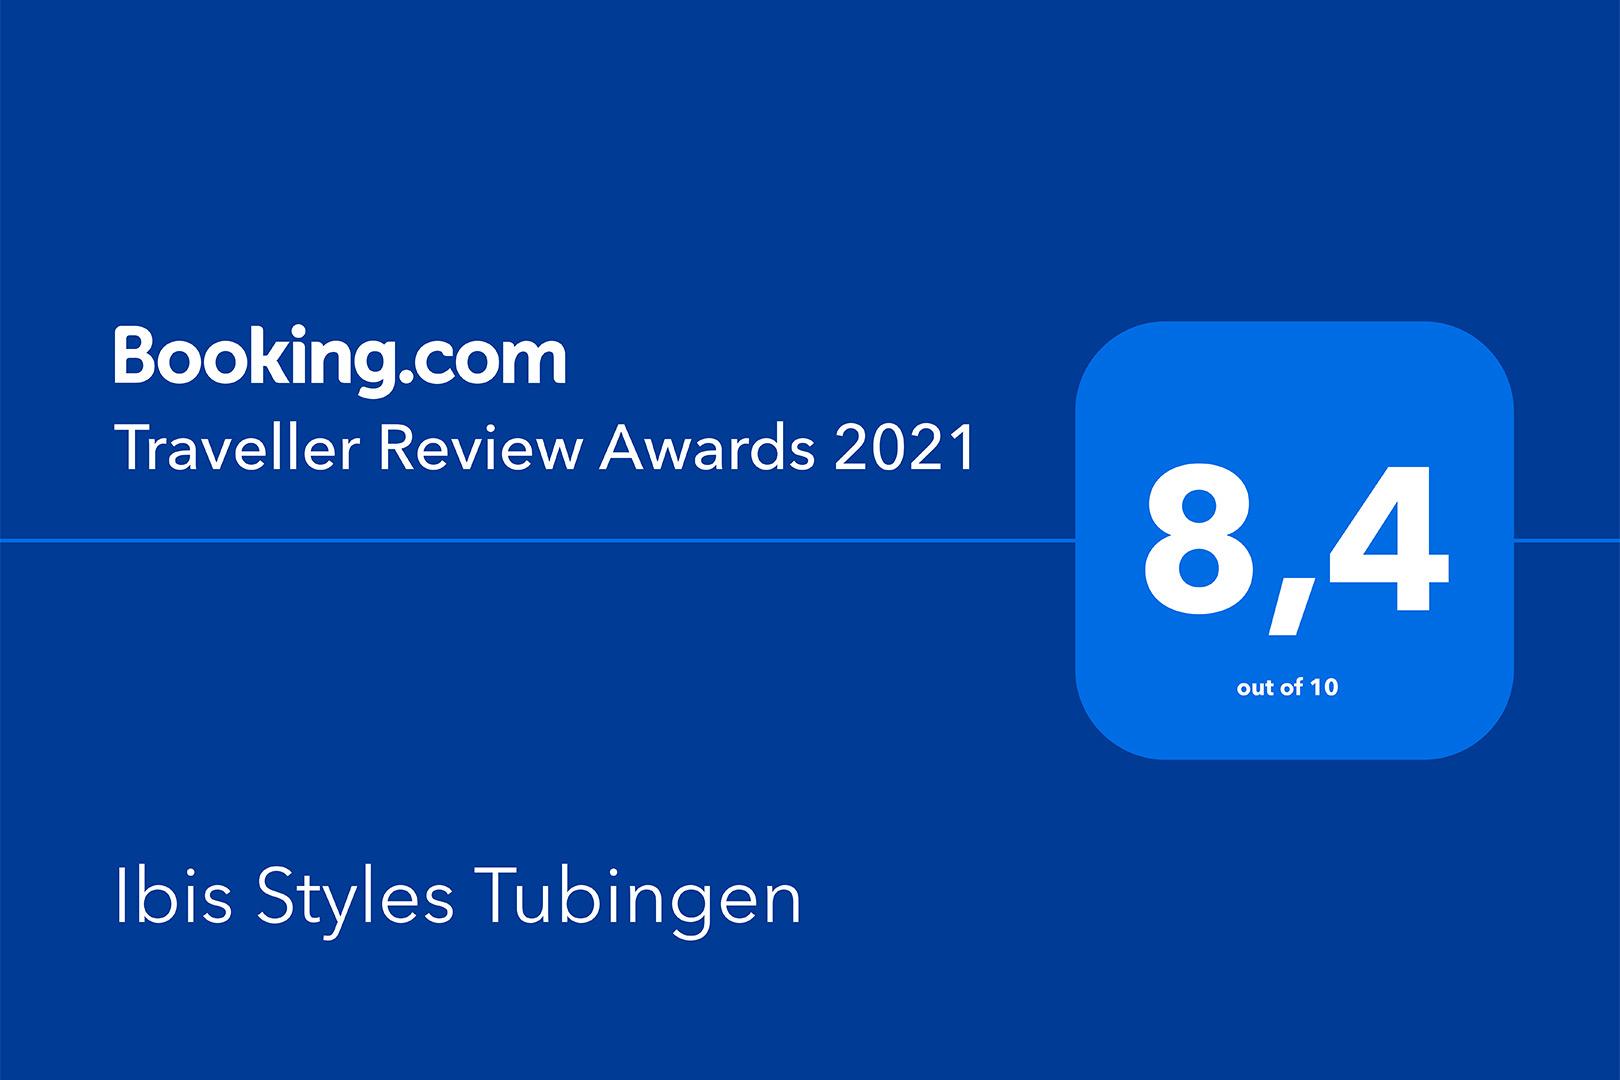 ibis Styles Tübingen - Traveller Review Award 2021